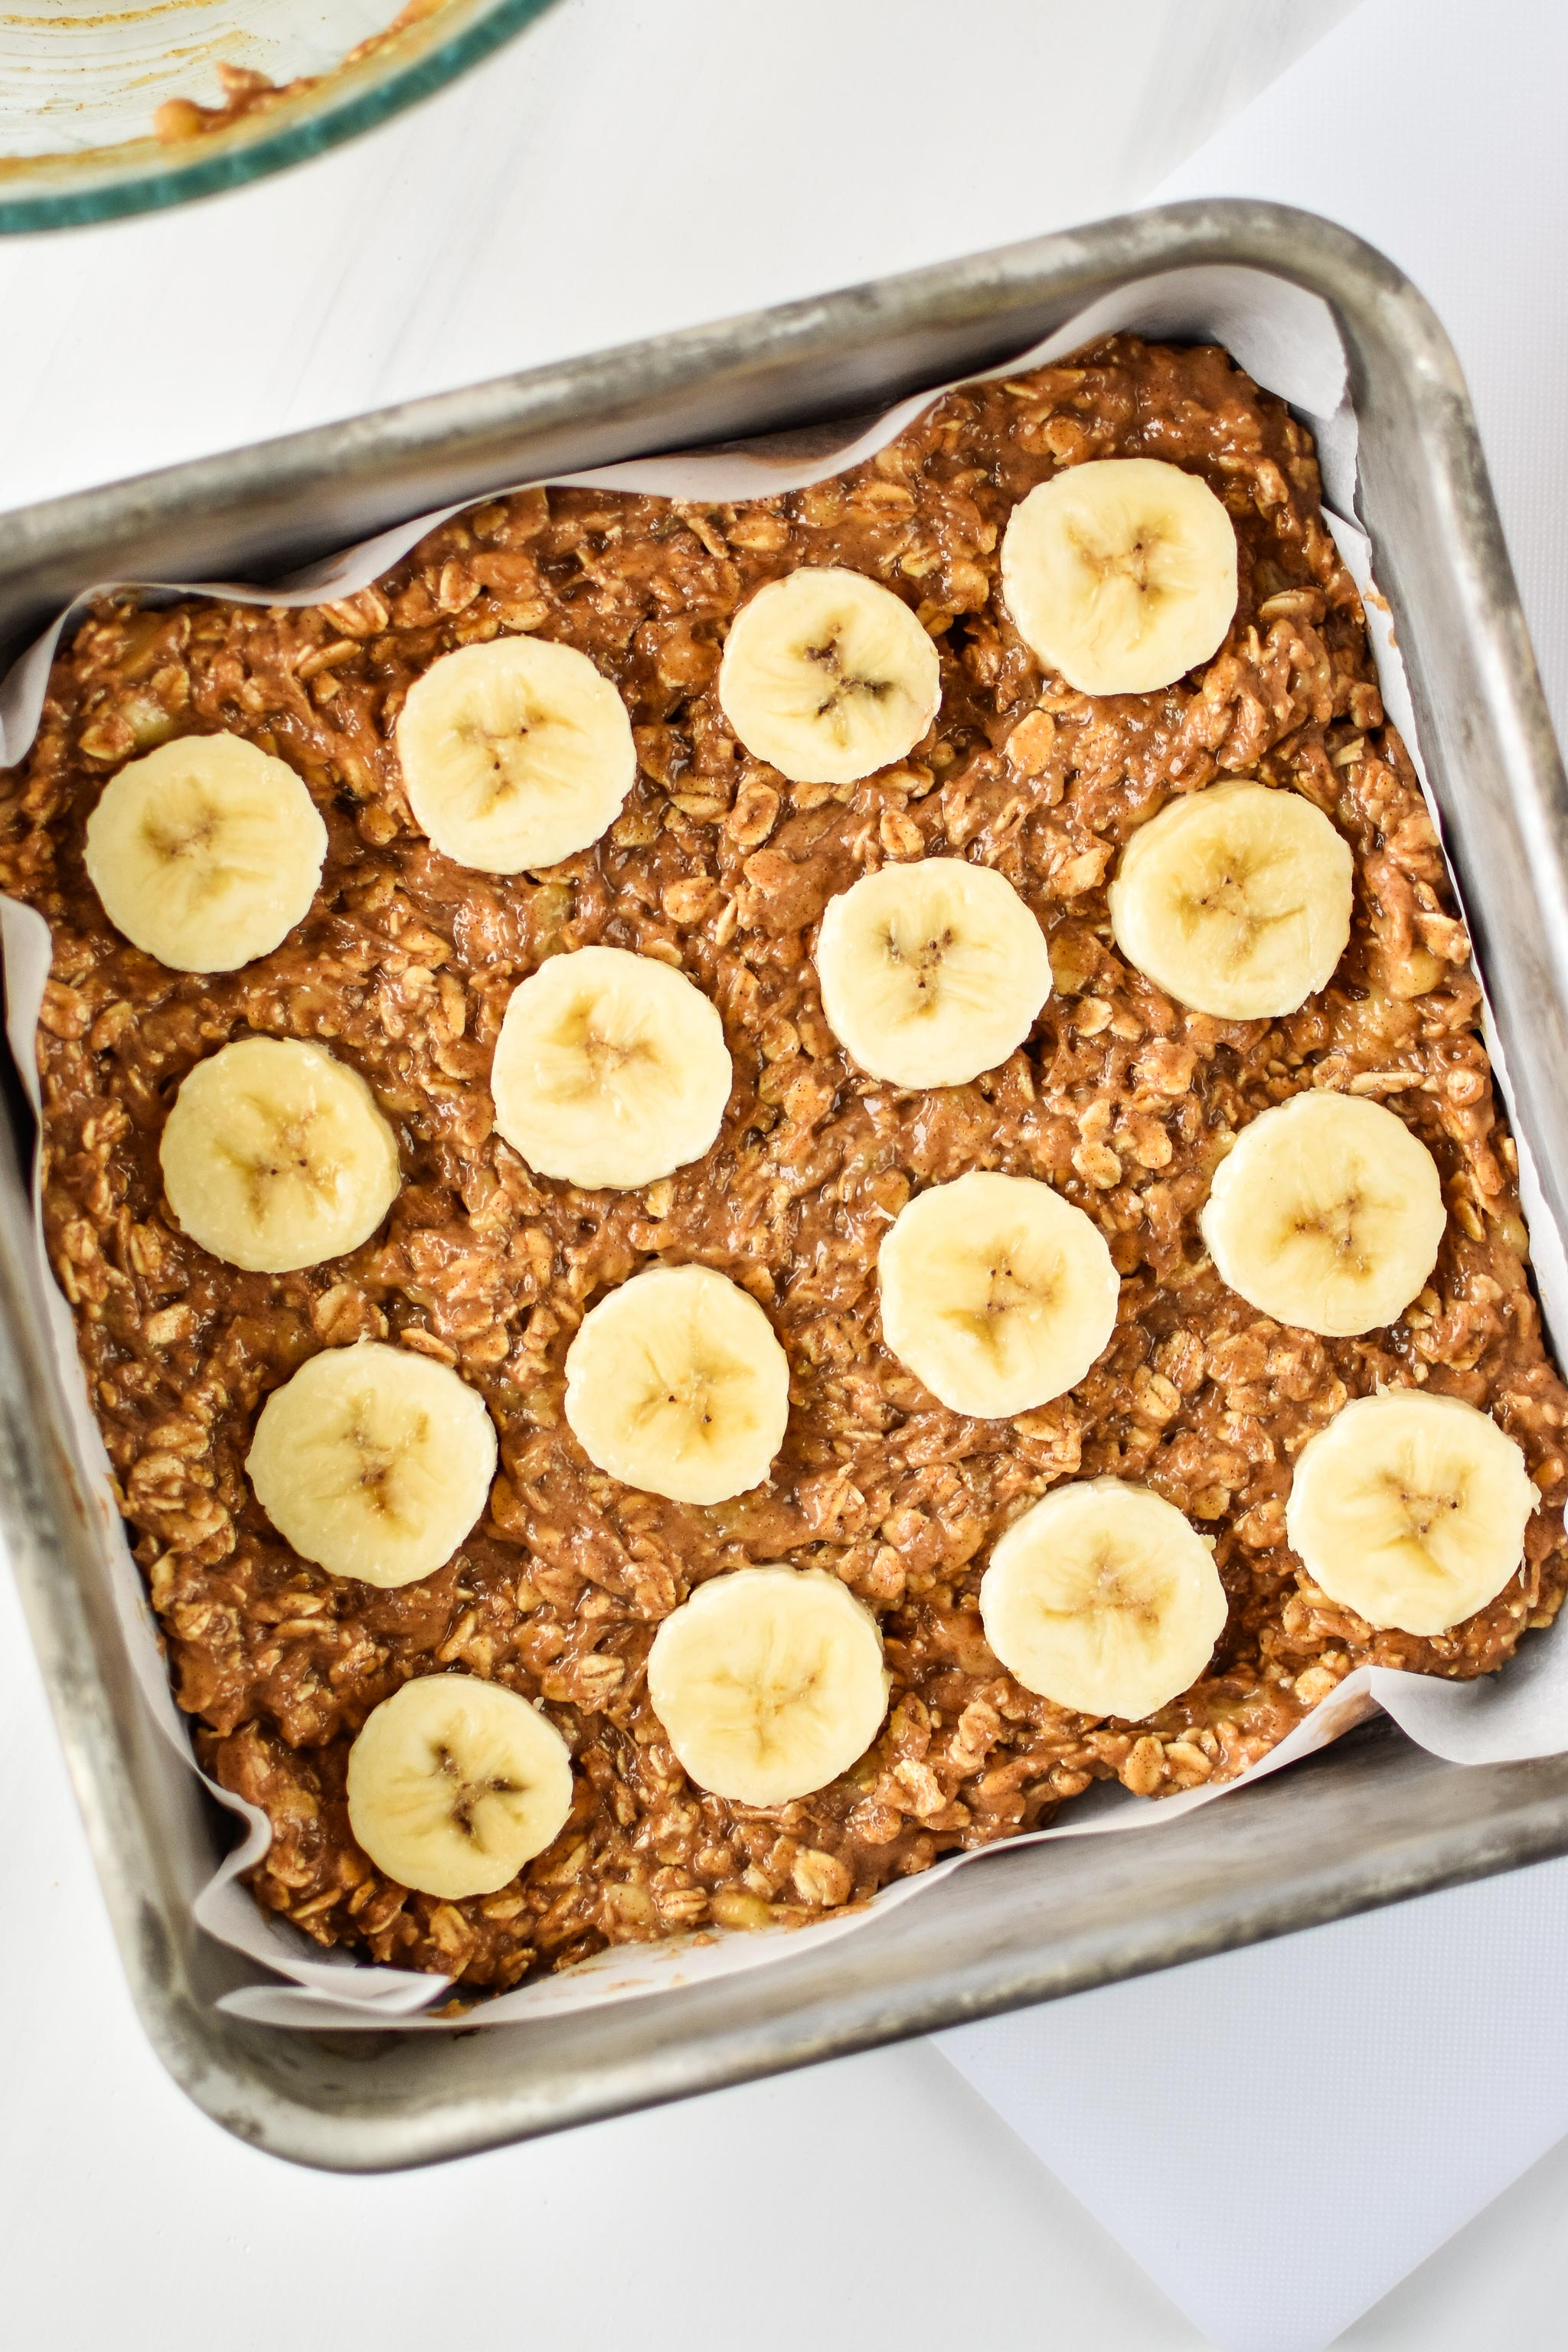 PB Banana Oatmeal Breakfast Bars ready for the oven.